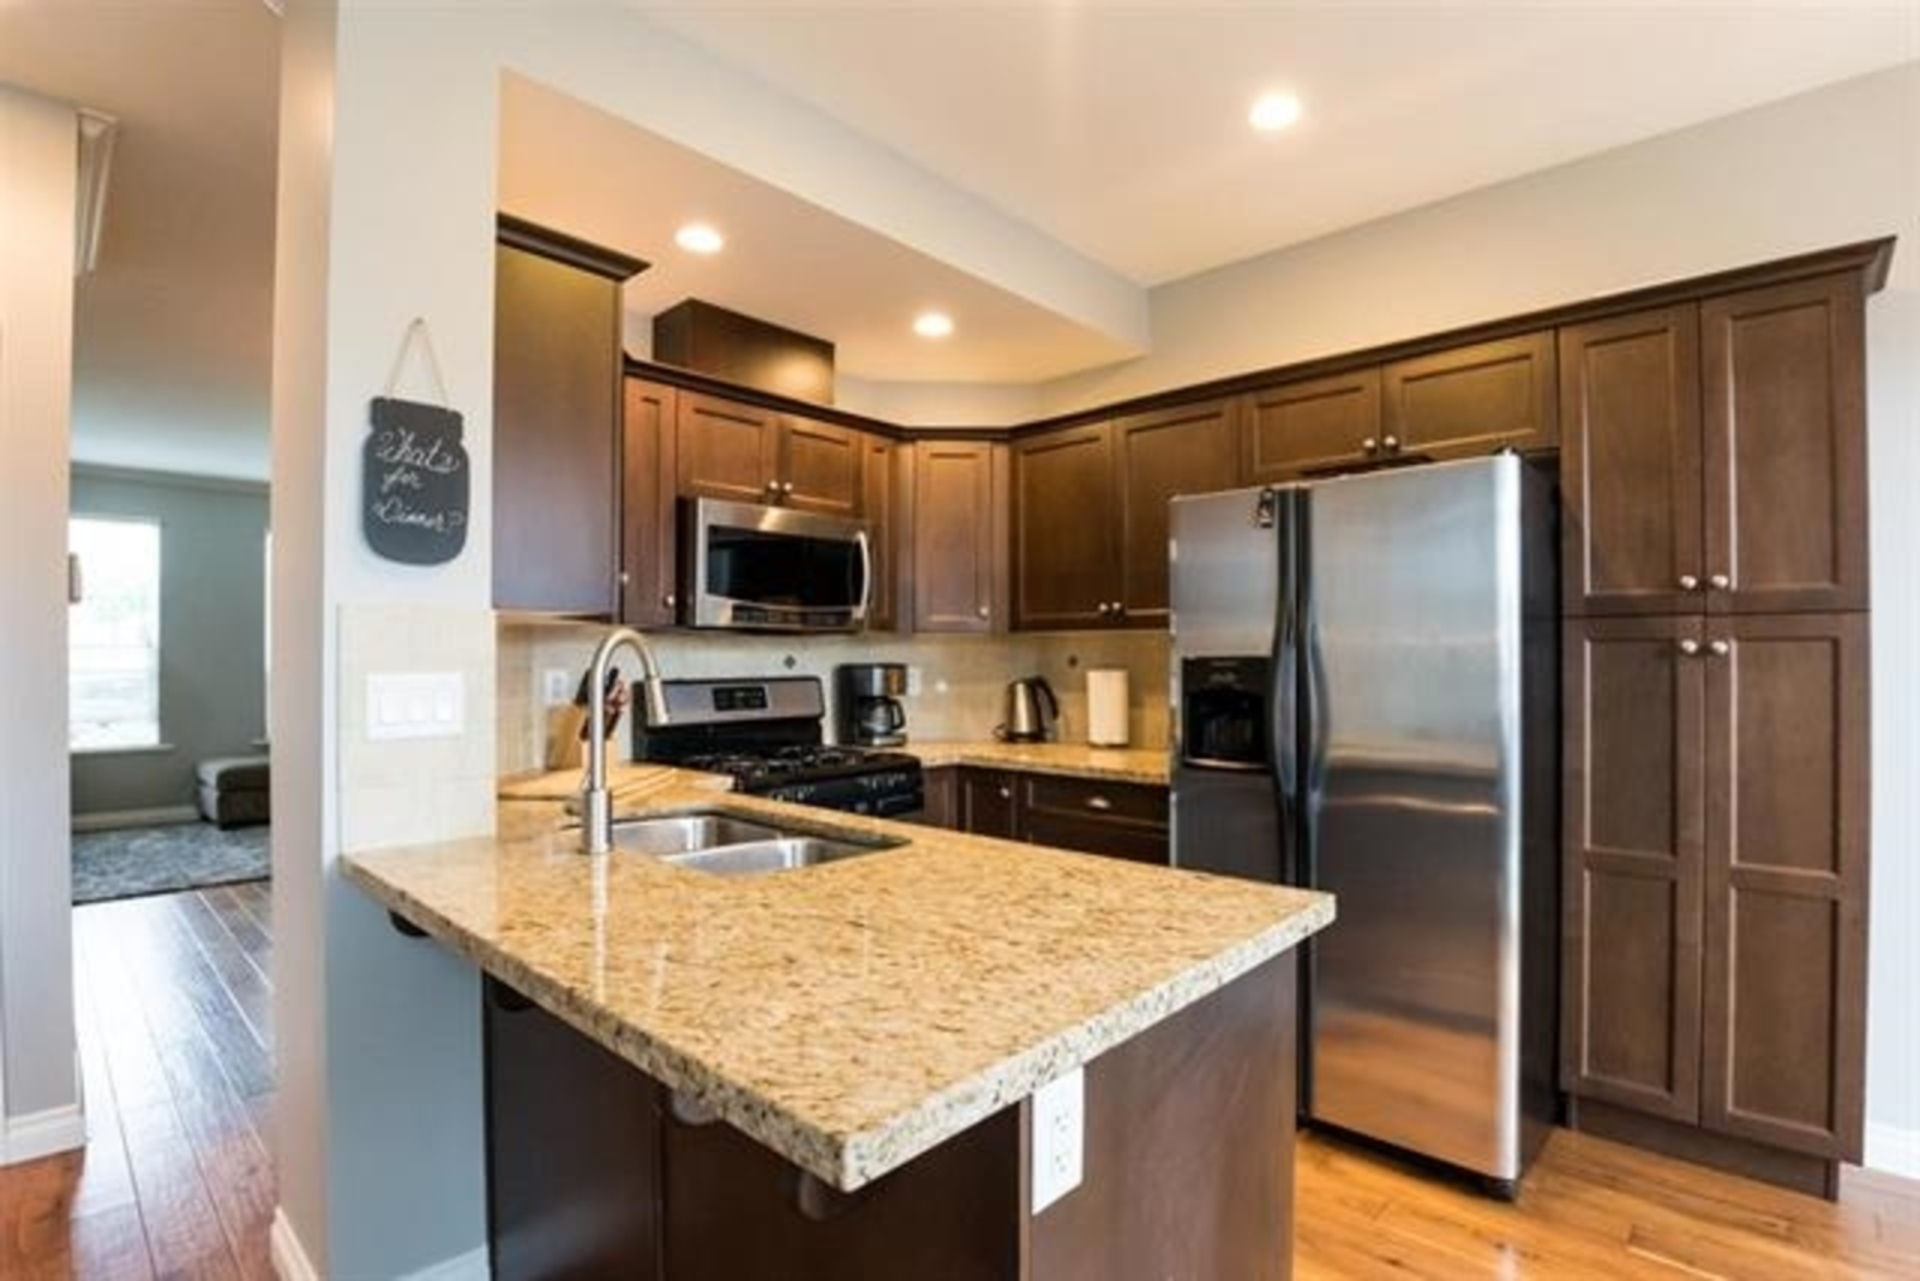 7039-180-street-cloverdale-bc-cloverdale-07 at 7039 180 Street, Cloverdale BC, Cloverdale